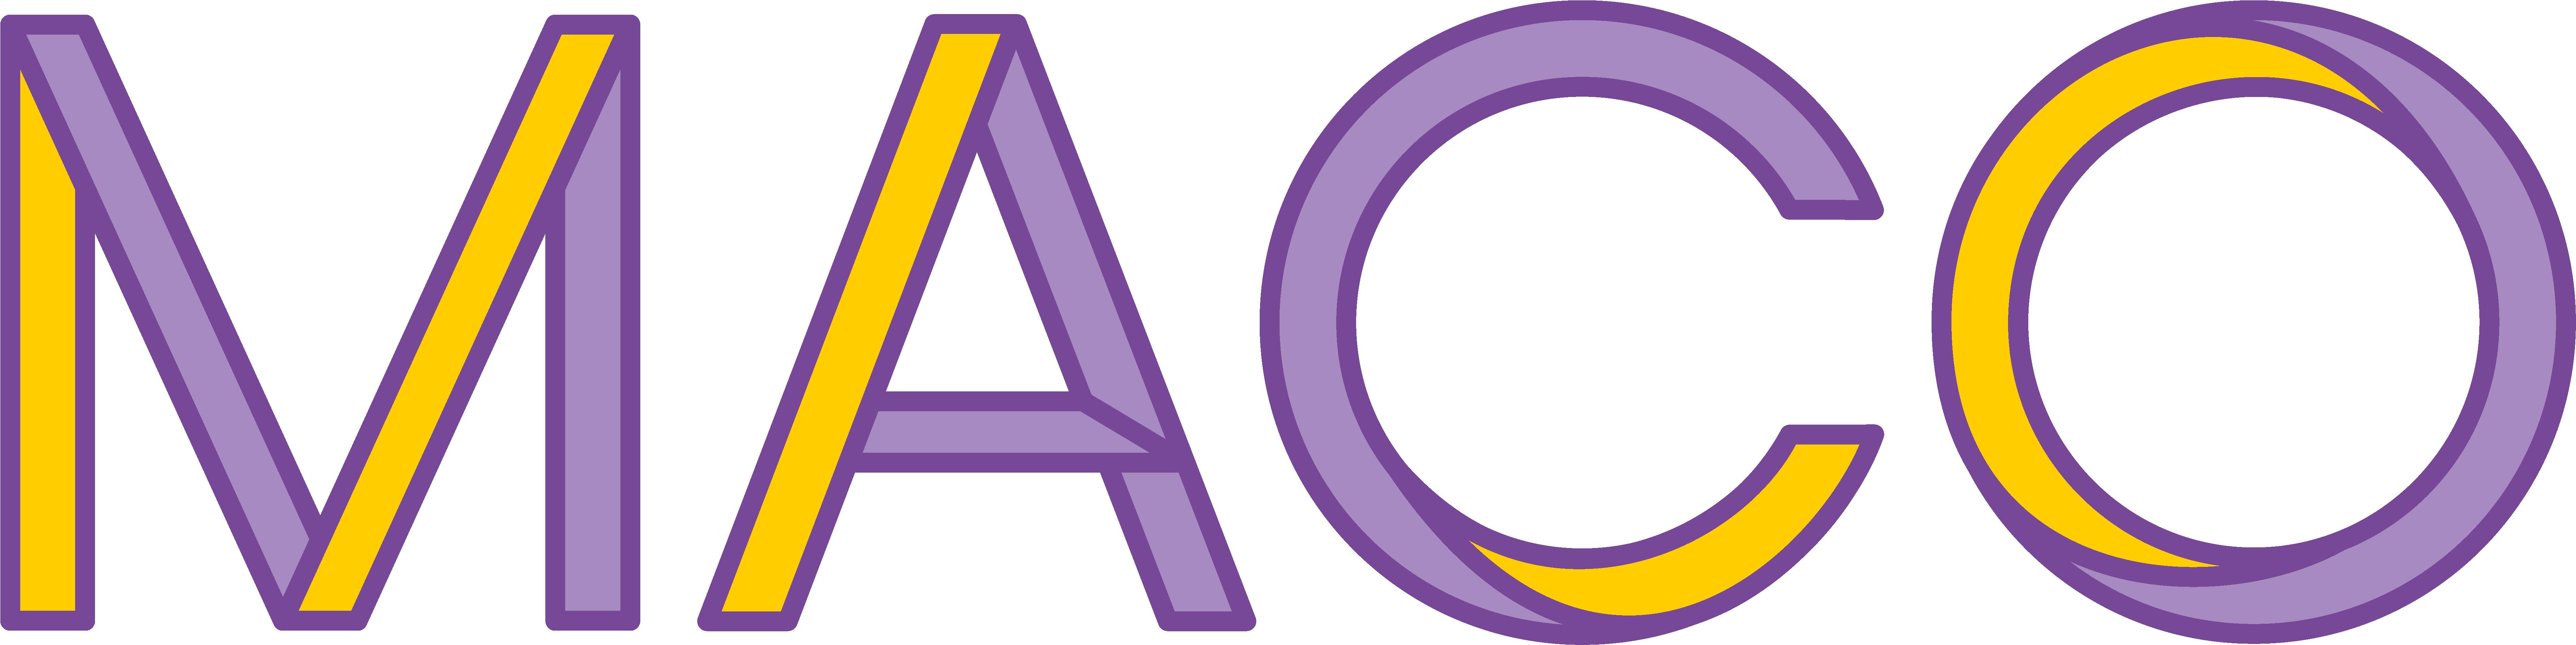 MACO Logo 1 ligne RVB Couleur